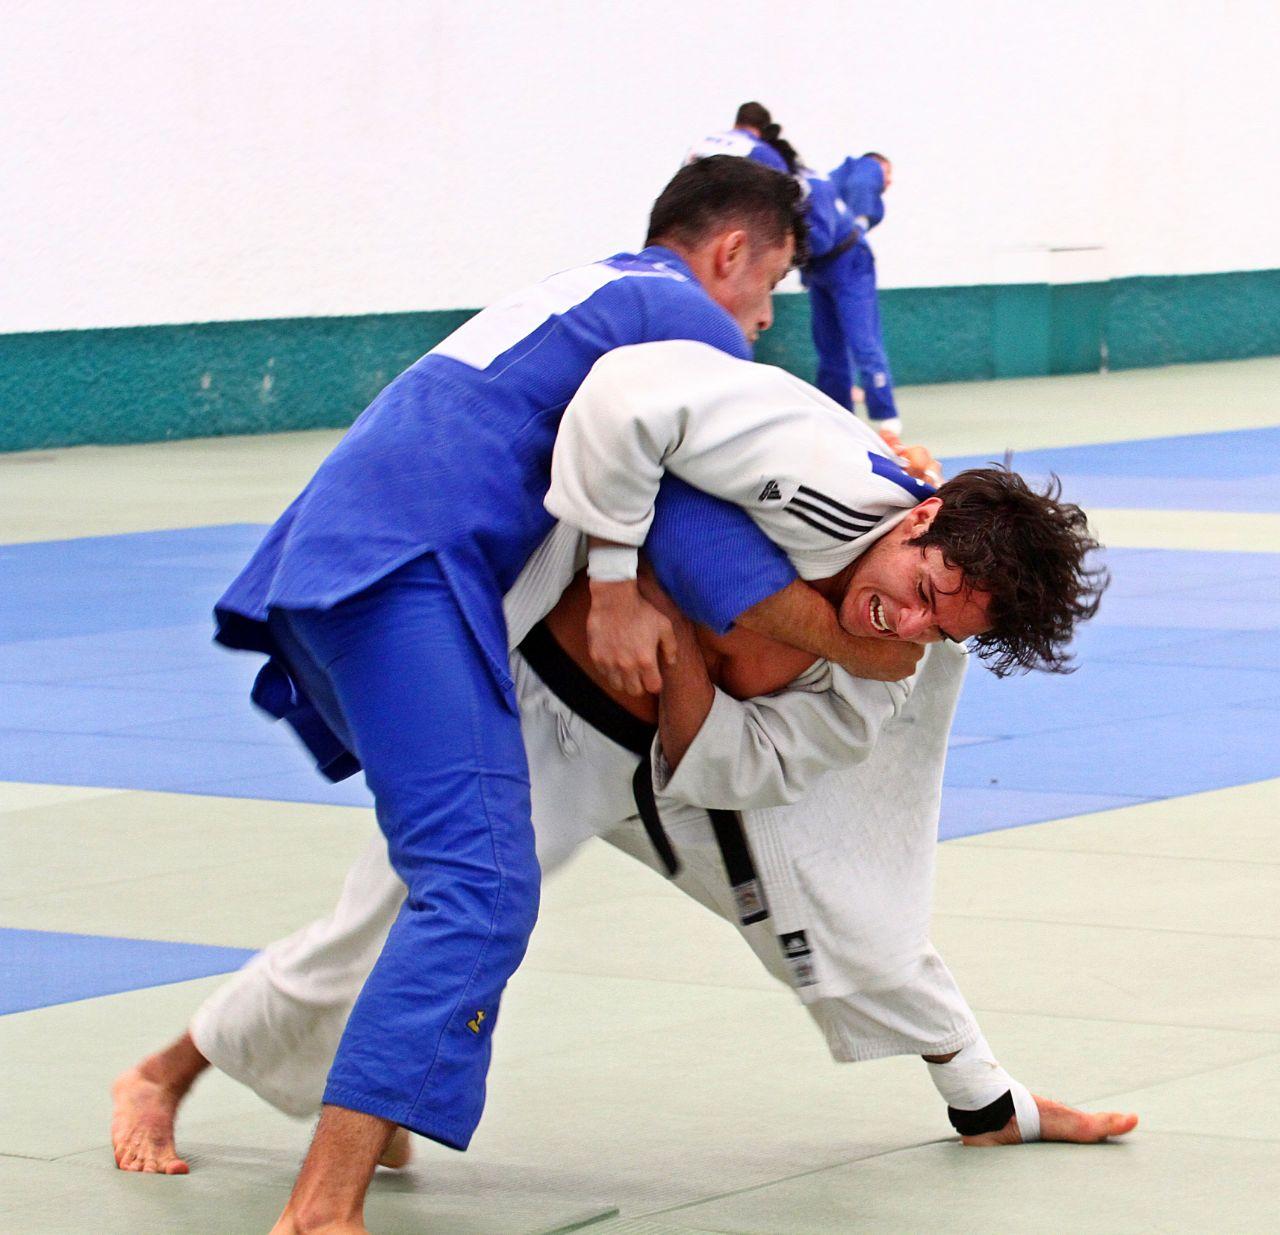 Eduardo Ávila enfrentará Panamericano y Mundial de IBSA en 2018